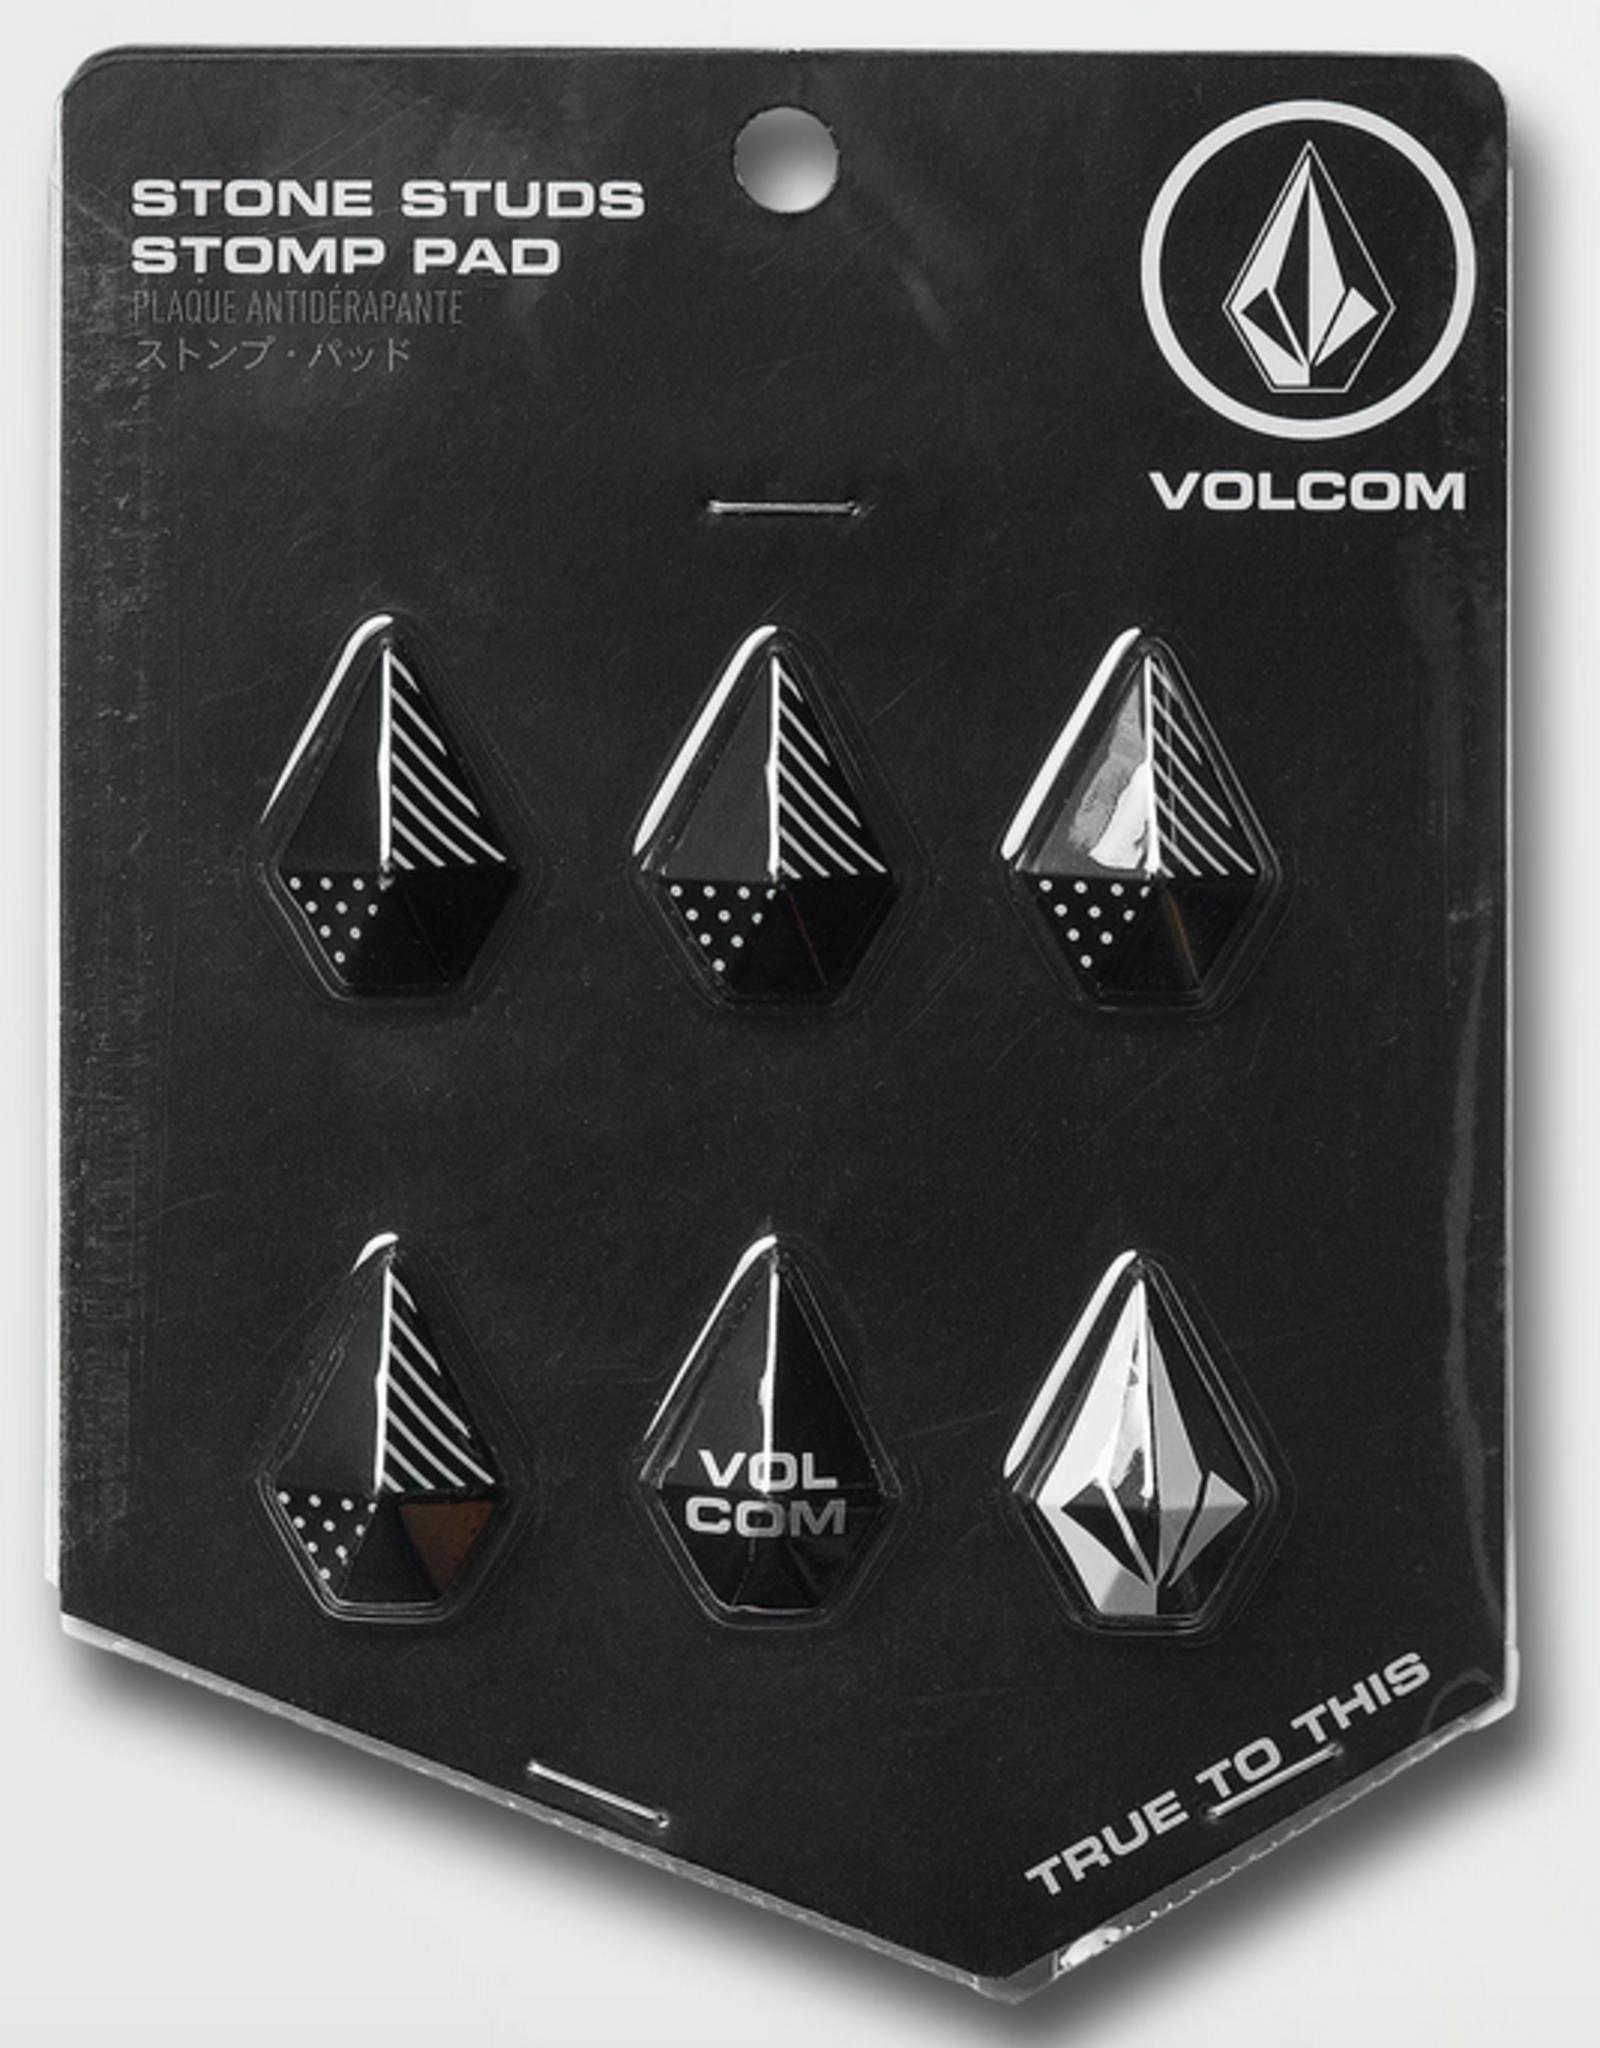 VOLCOM VOLCOM STONE STUDS STOMP PAD BLACK